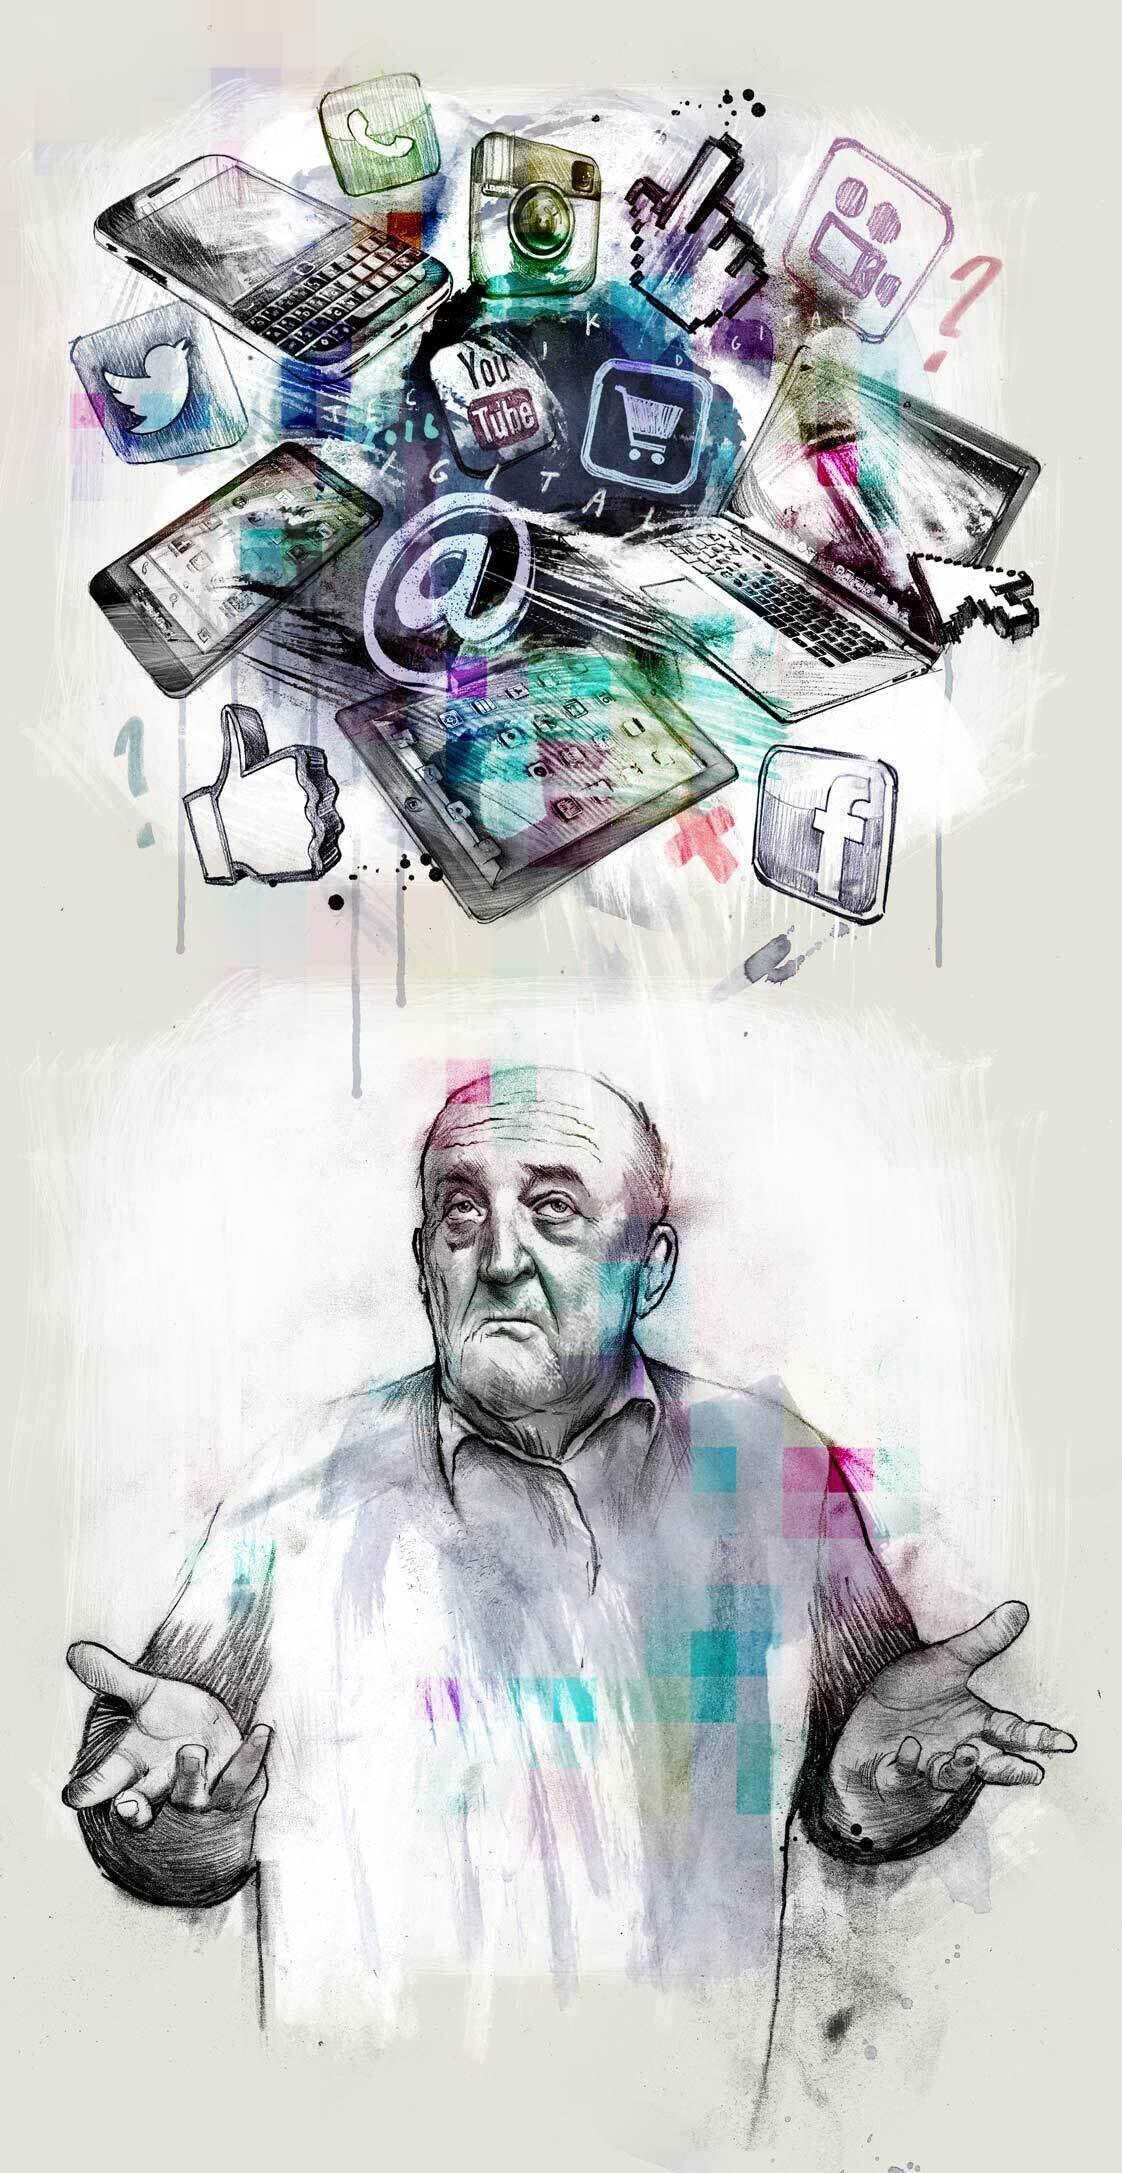 Technology age old man social media youtube smartphone facebook intagram twitter editorial illustration artwork - Kornel Illustration | Kornel Stadler portfolio